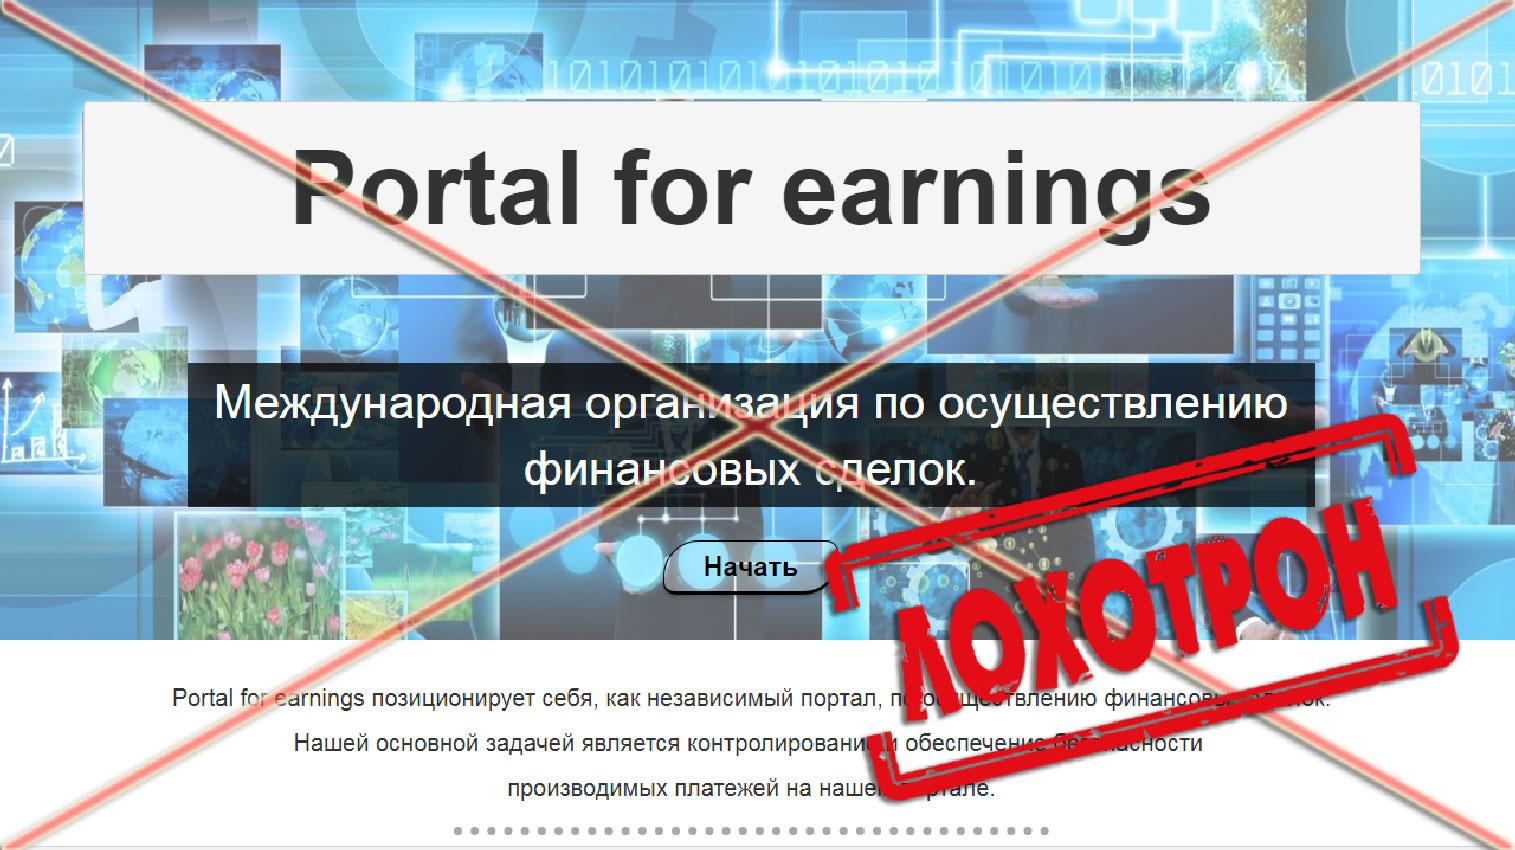 [Лохотрон] Сергей Самусев Portal for earnings – отзывы